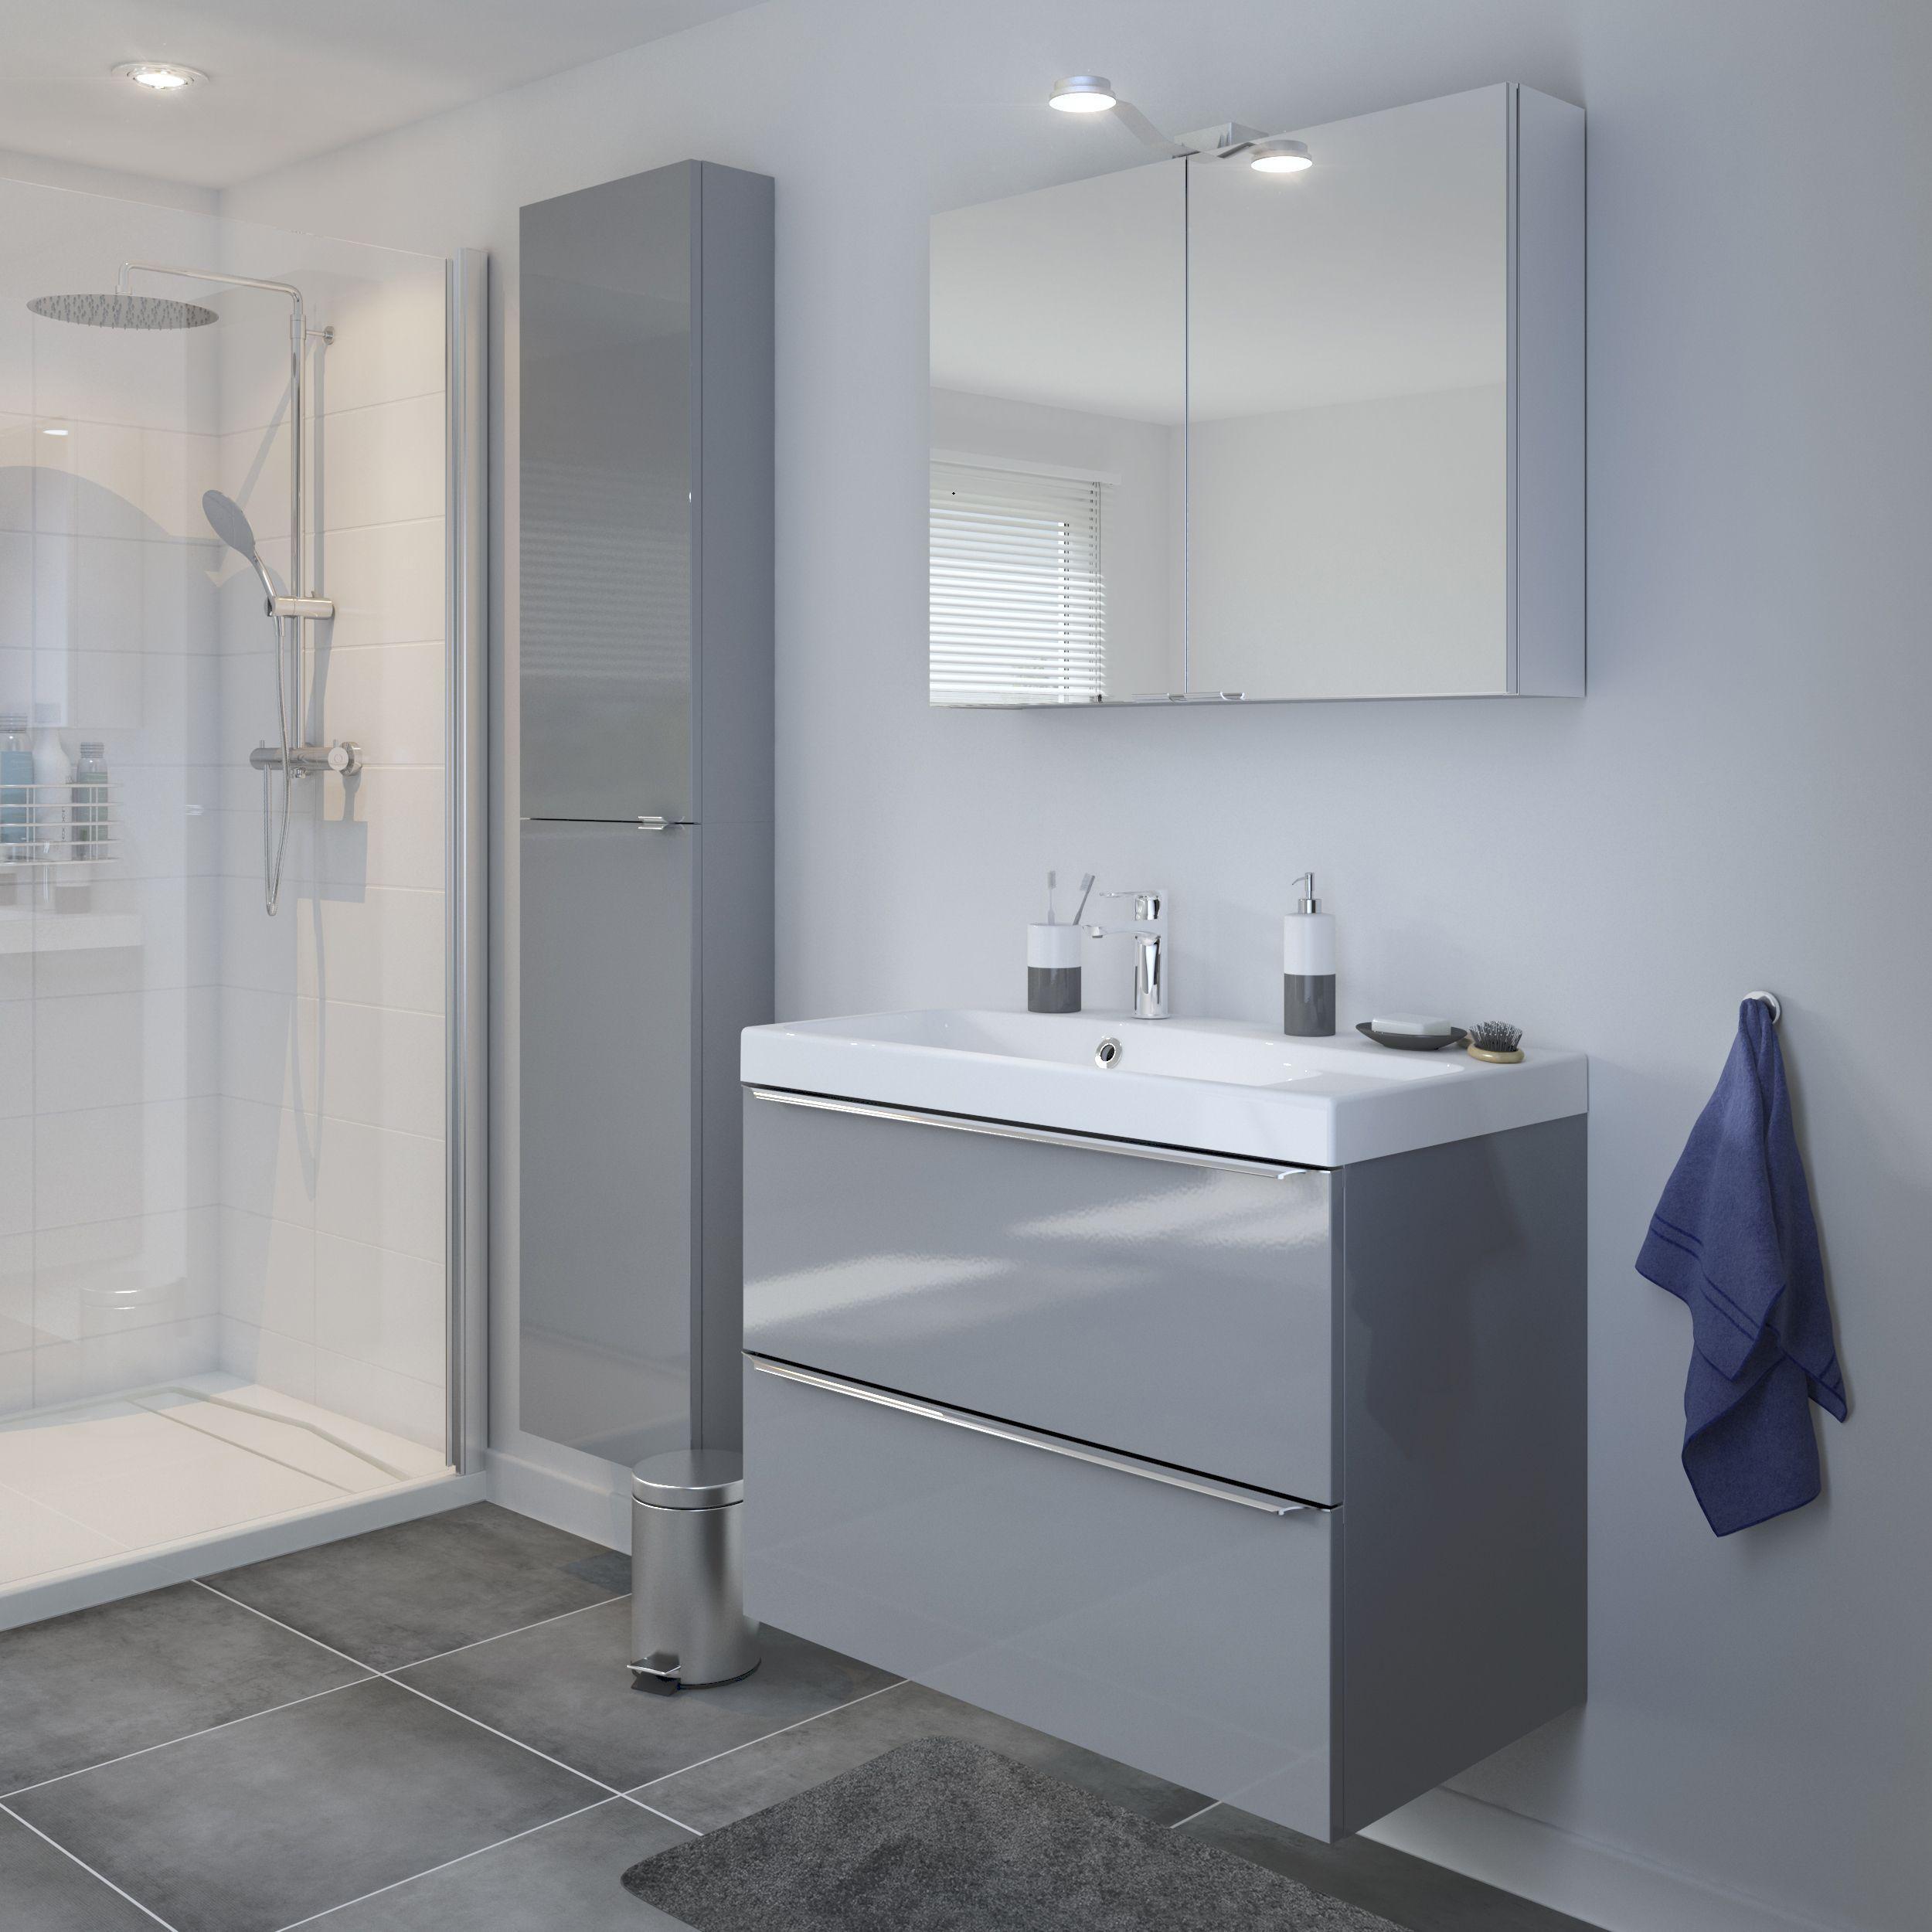 Goodhome Imandra Gloss Grey Vanity Basin Unit W 800mm In 2020